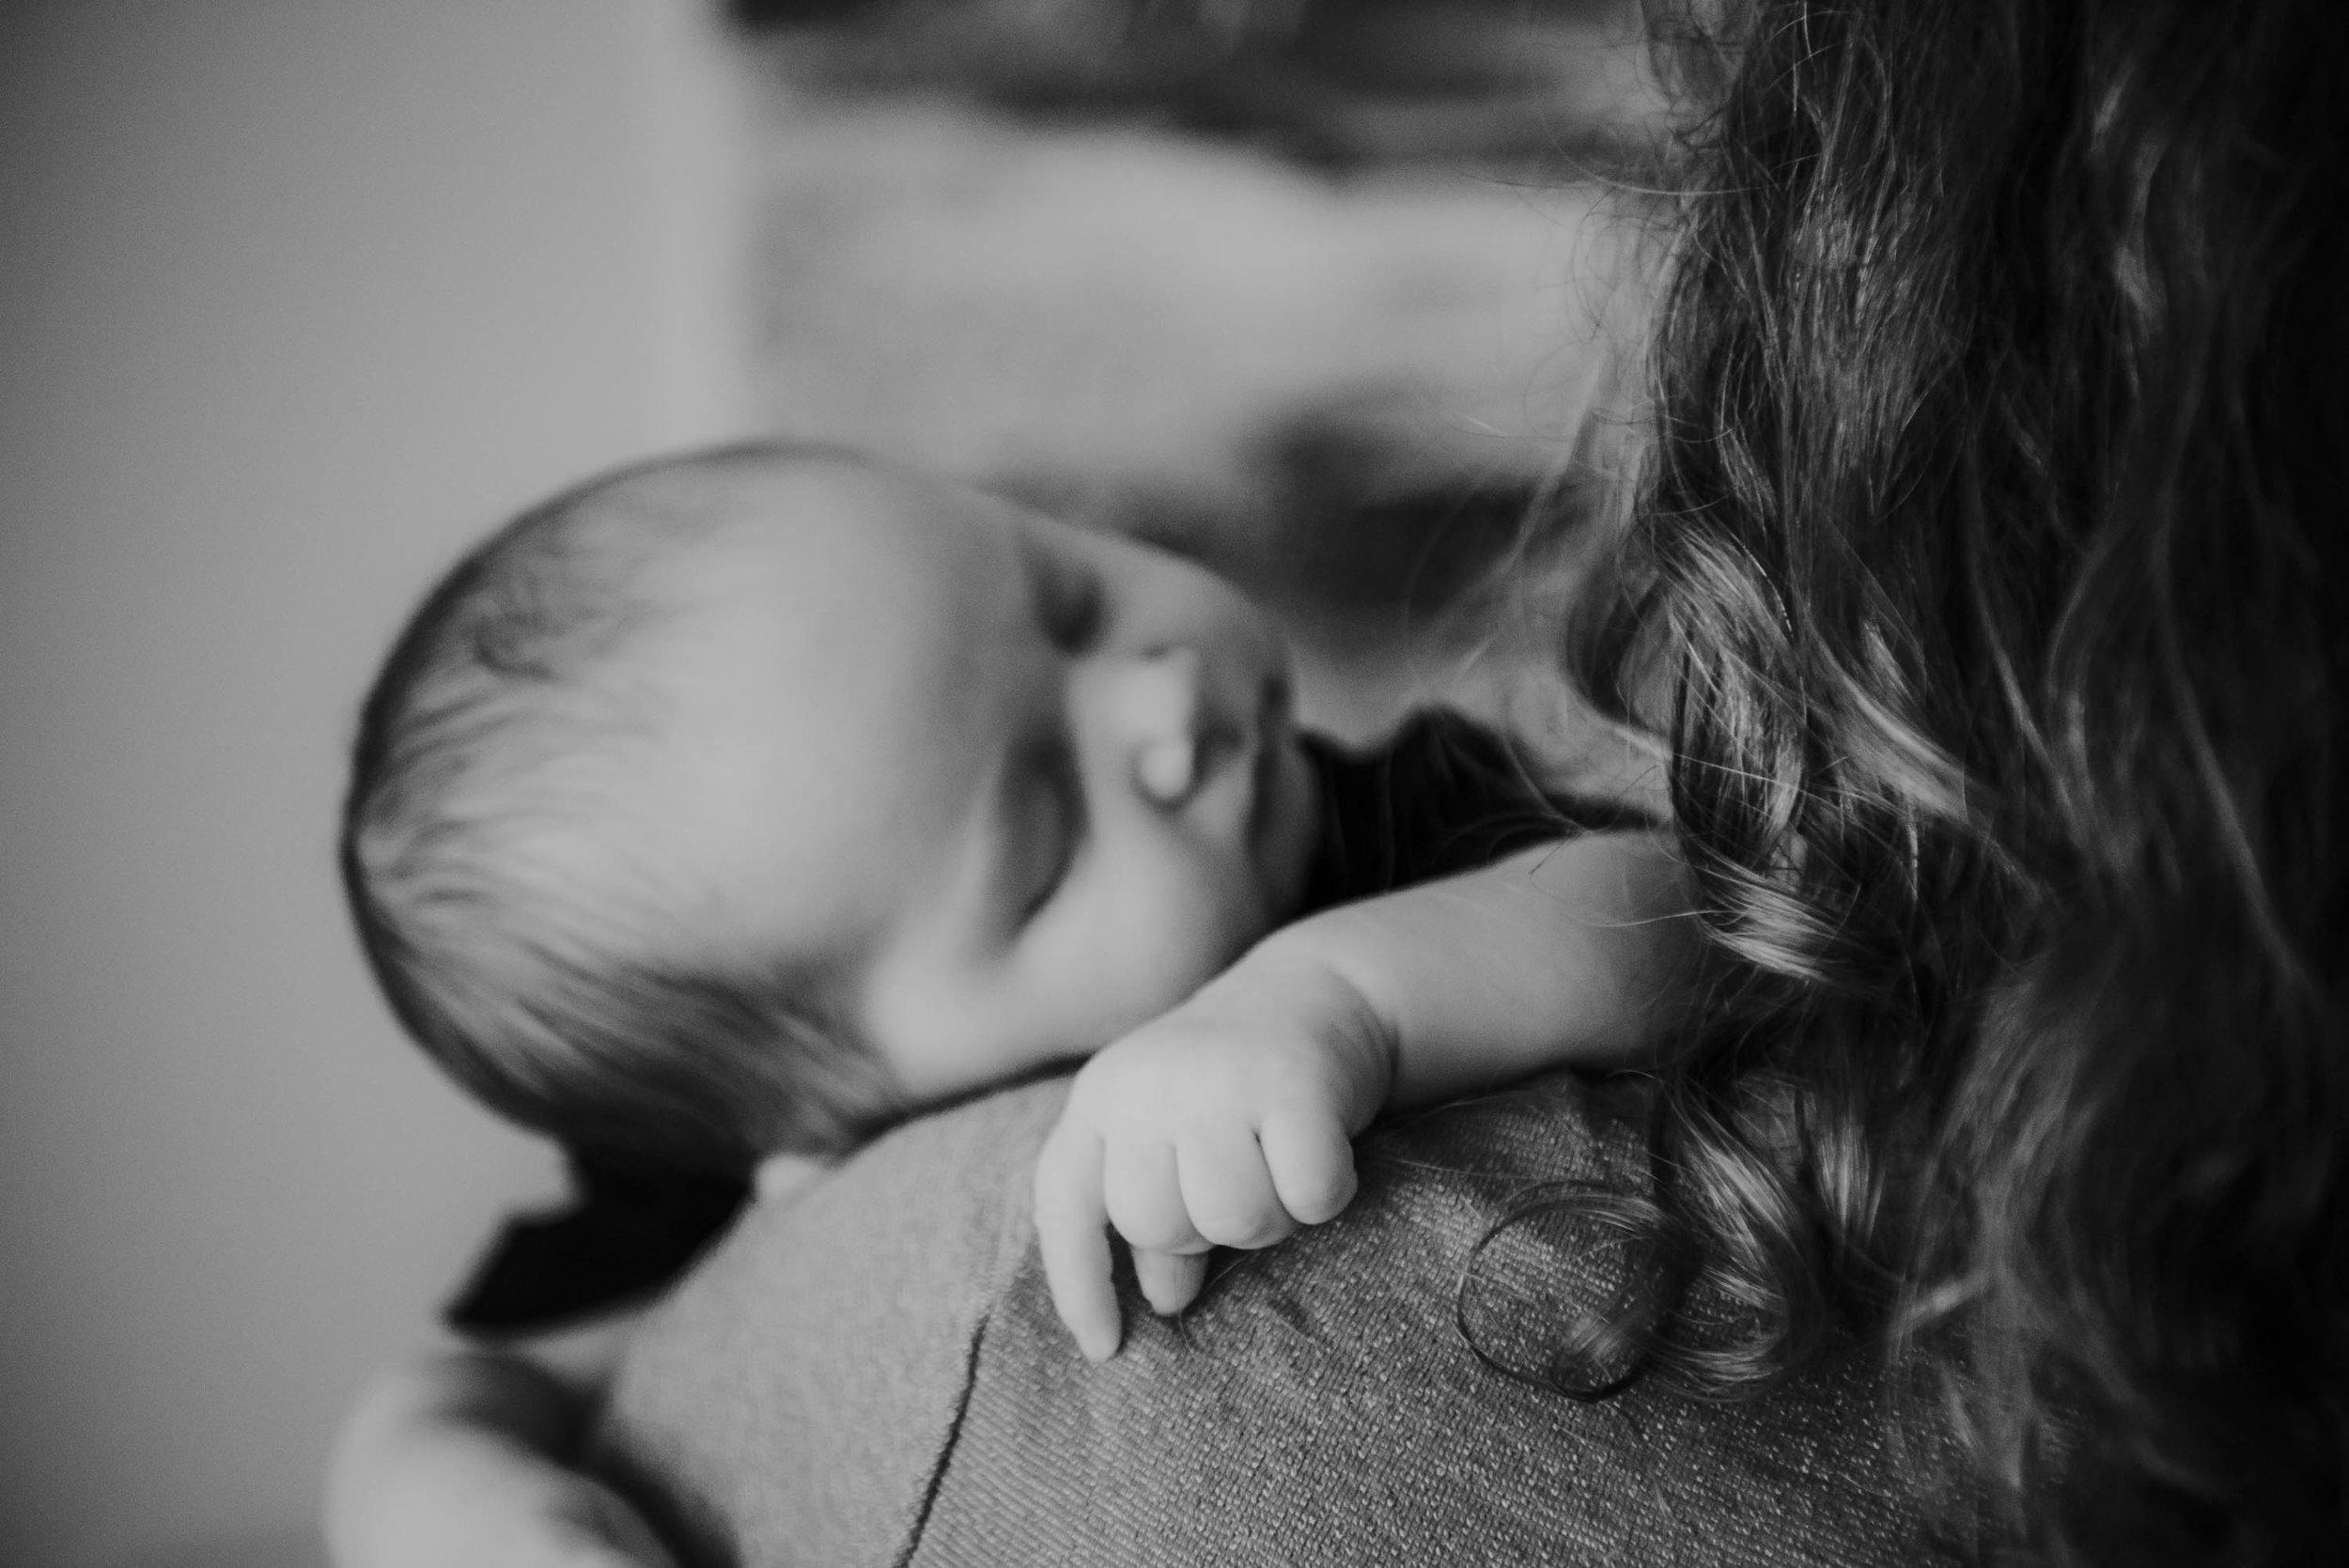 Lets_Spread_Beauty_Photography_Hamill Newborn20150728_0571.jpg